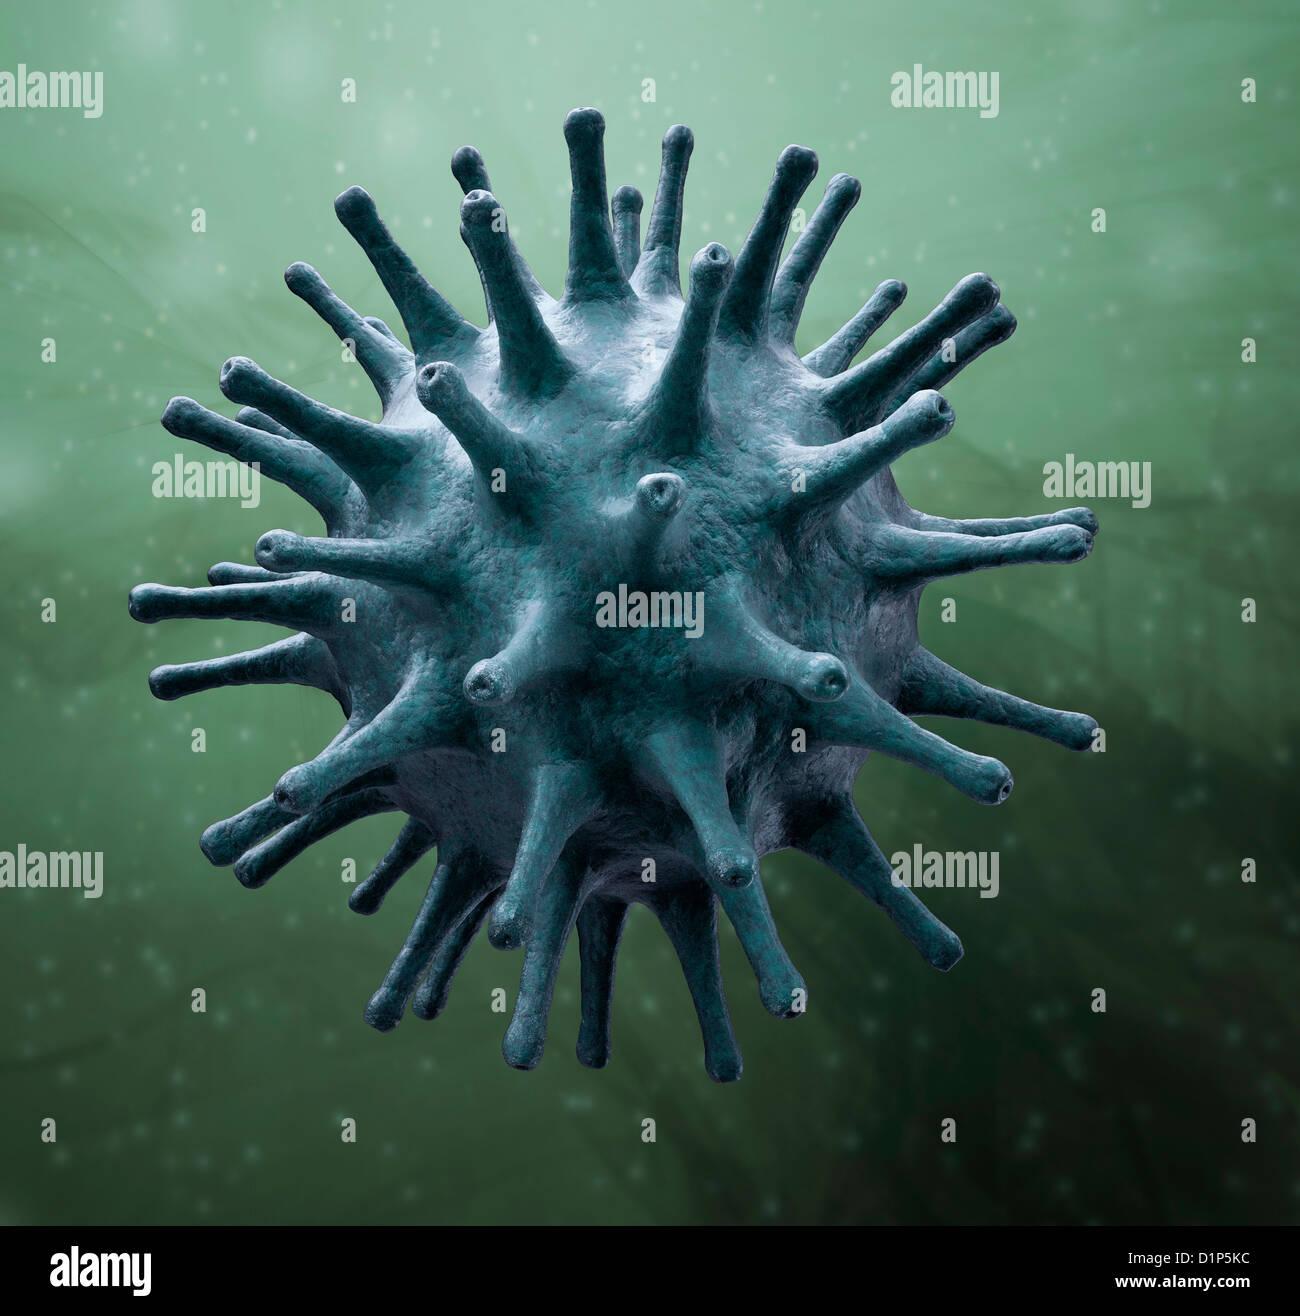 Virus particle, artwork - Stock Image